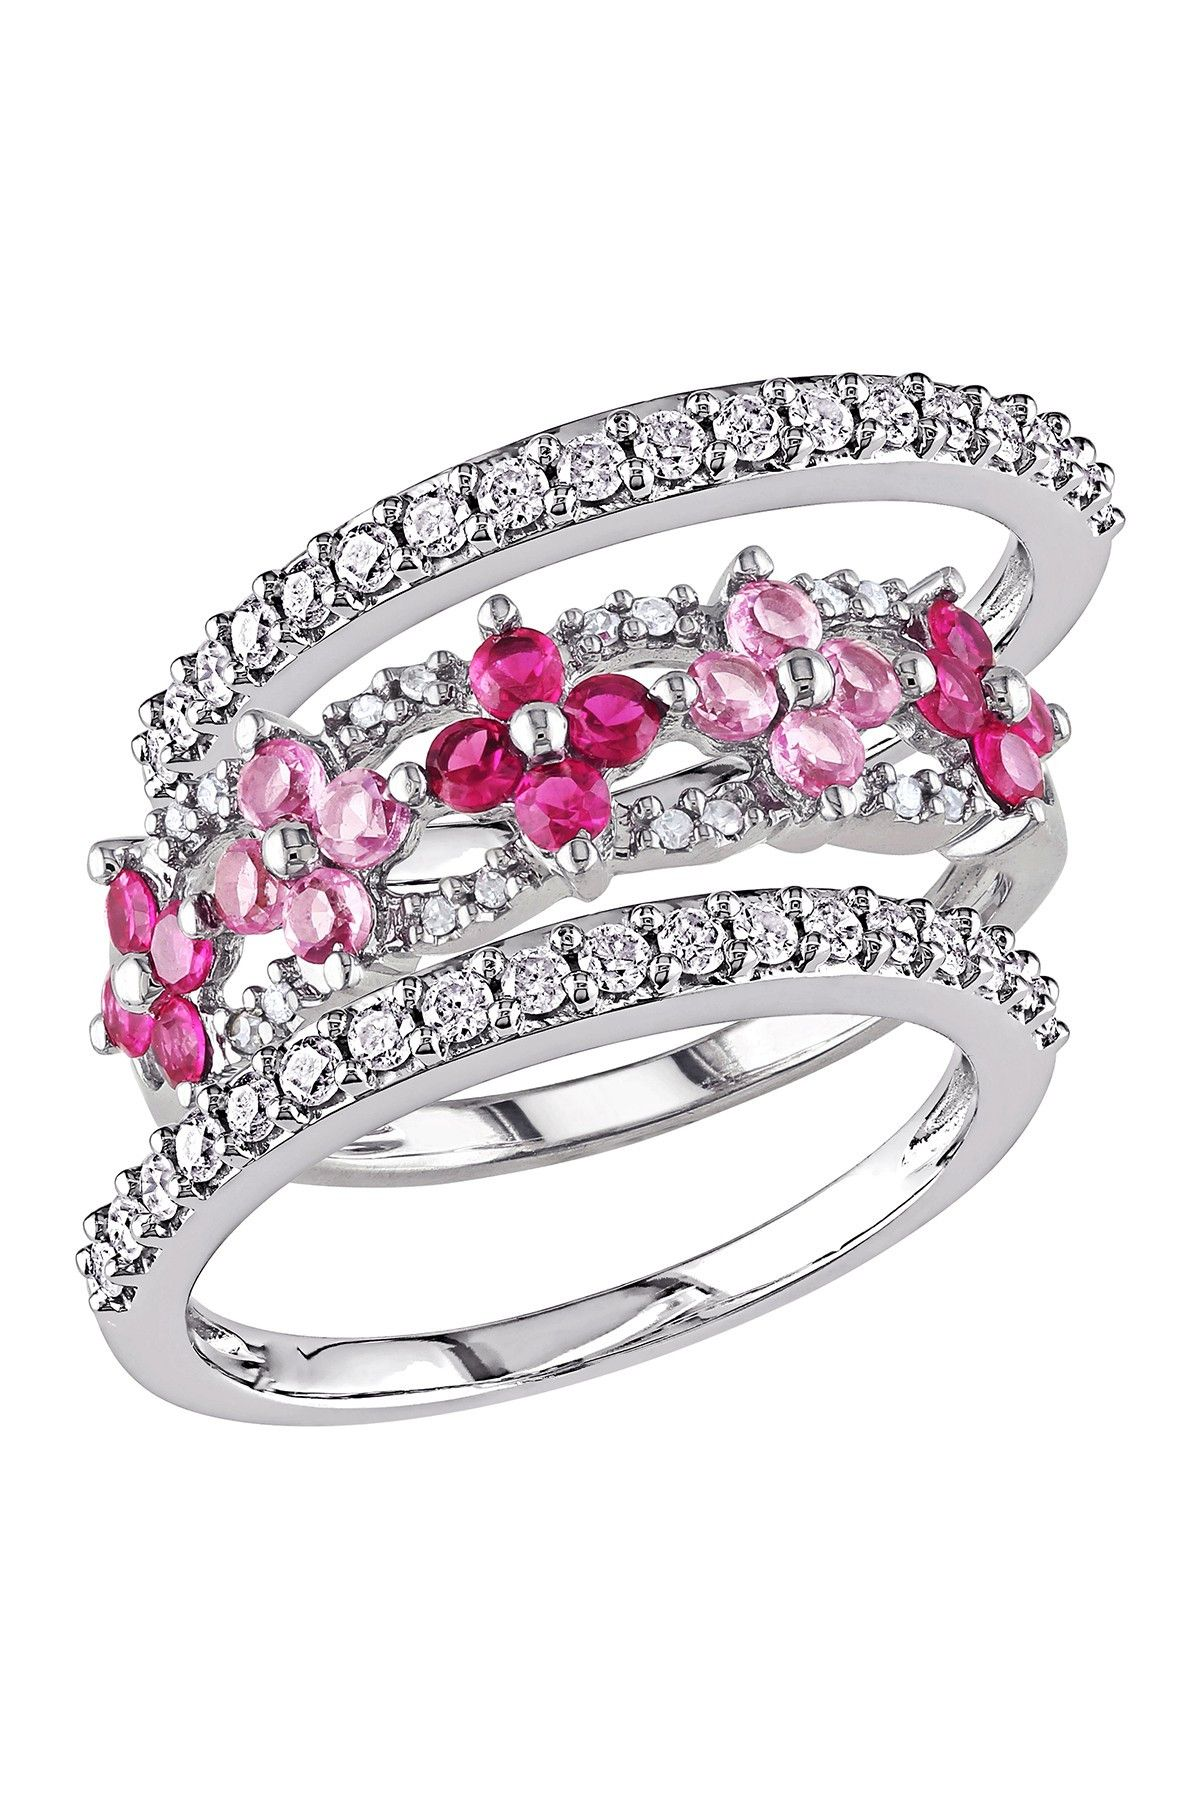 10k White Gold White Diamond Created Ruby Created Pink Sapphire